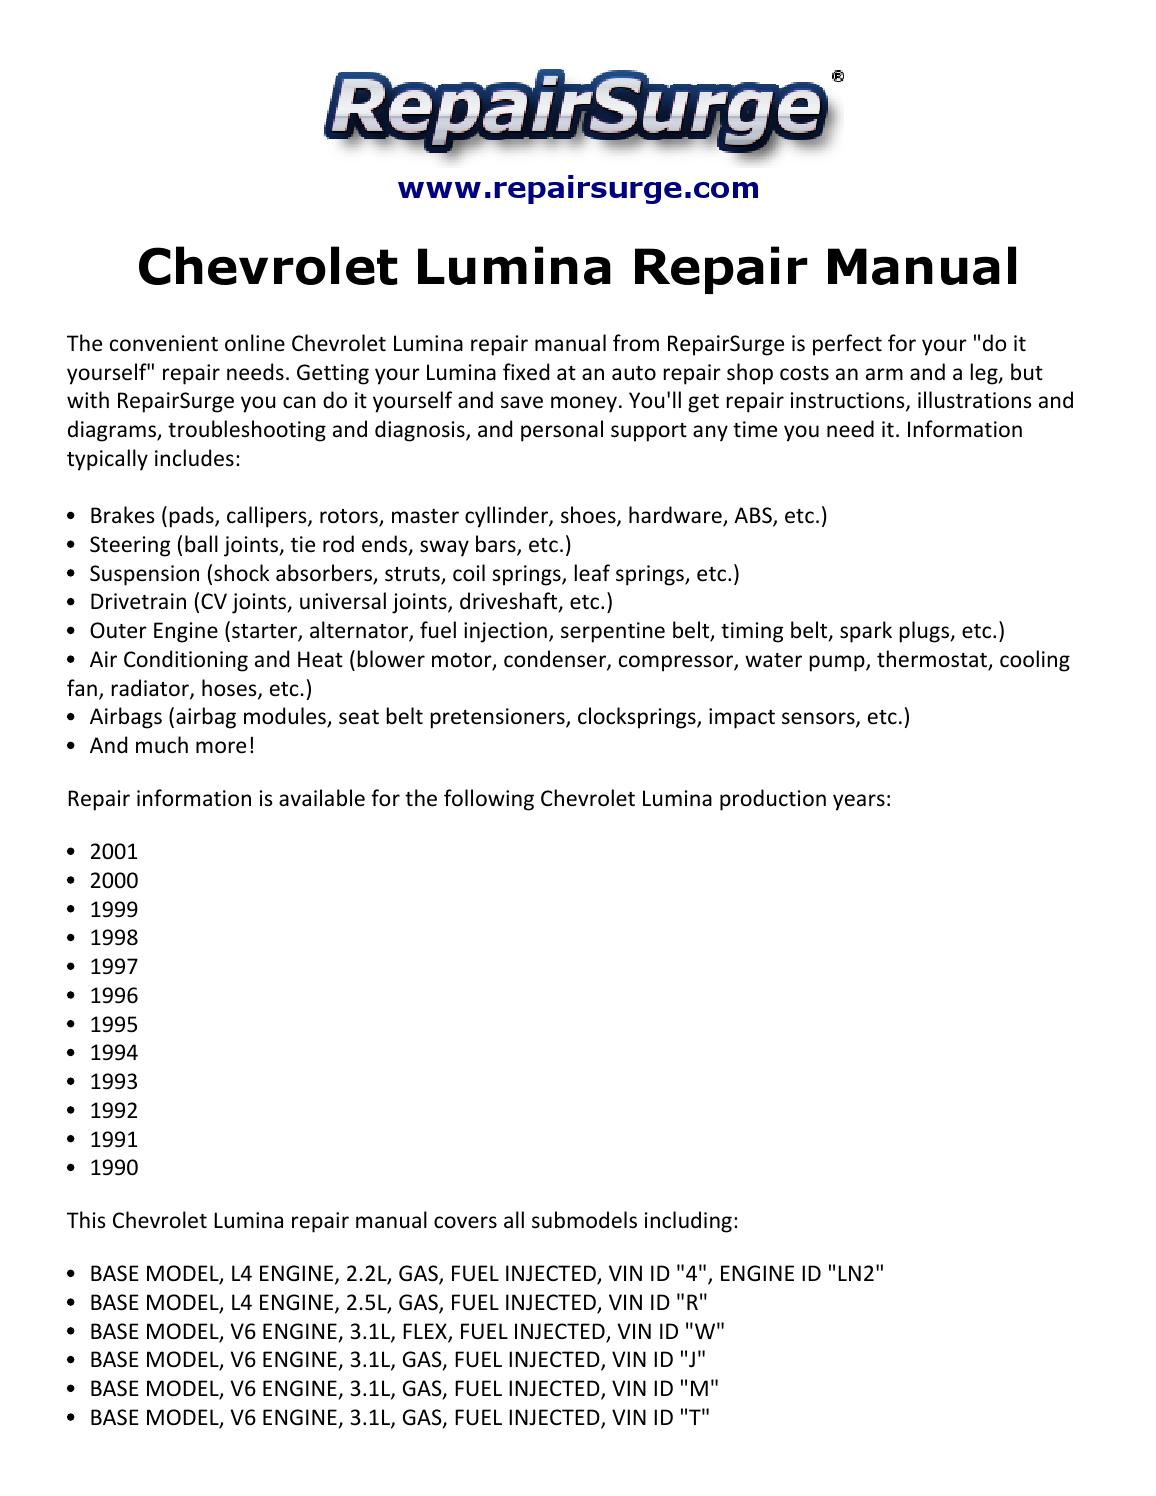 hight resolution of chevrolet lumina repair manual 1990 2001